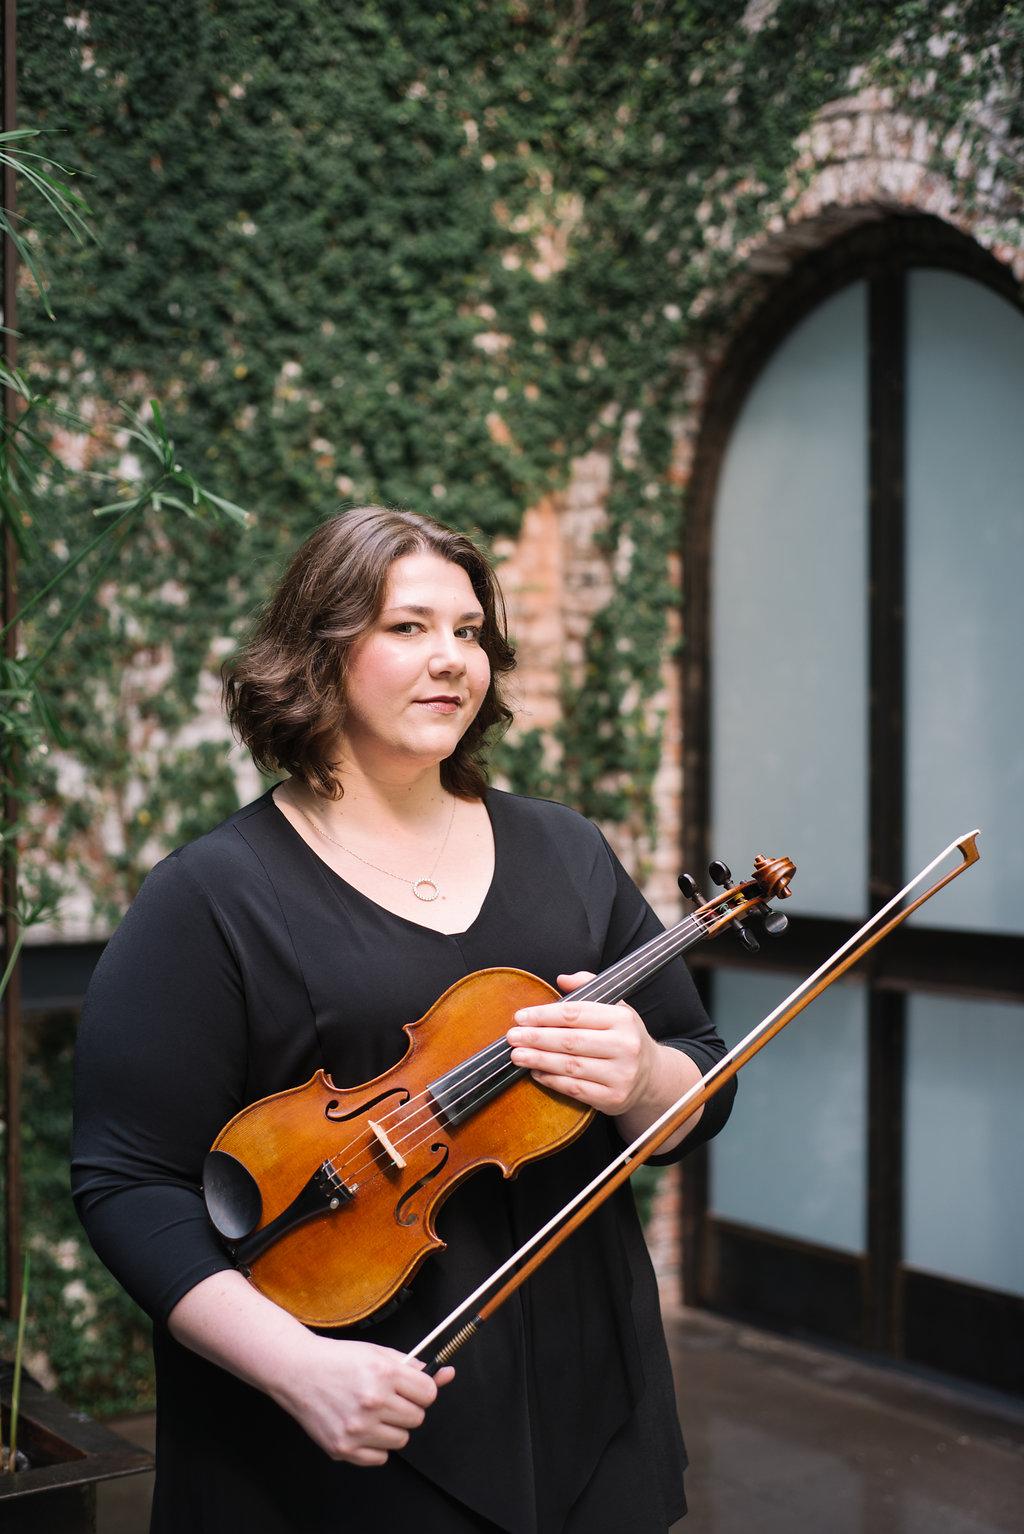 Copy of Catherine Colquhoun - Violin